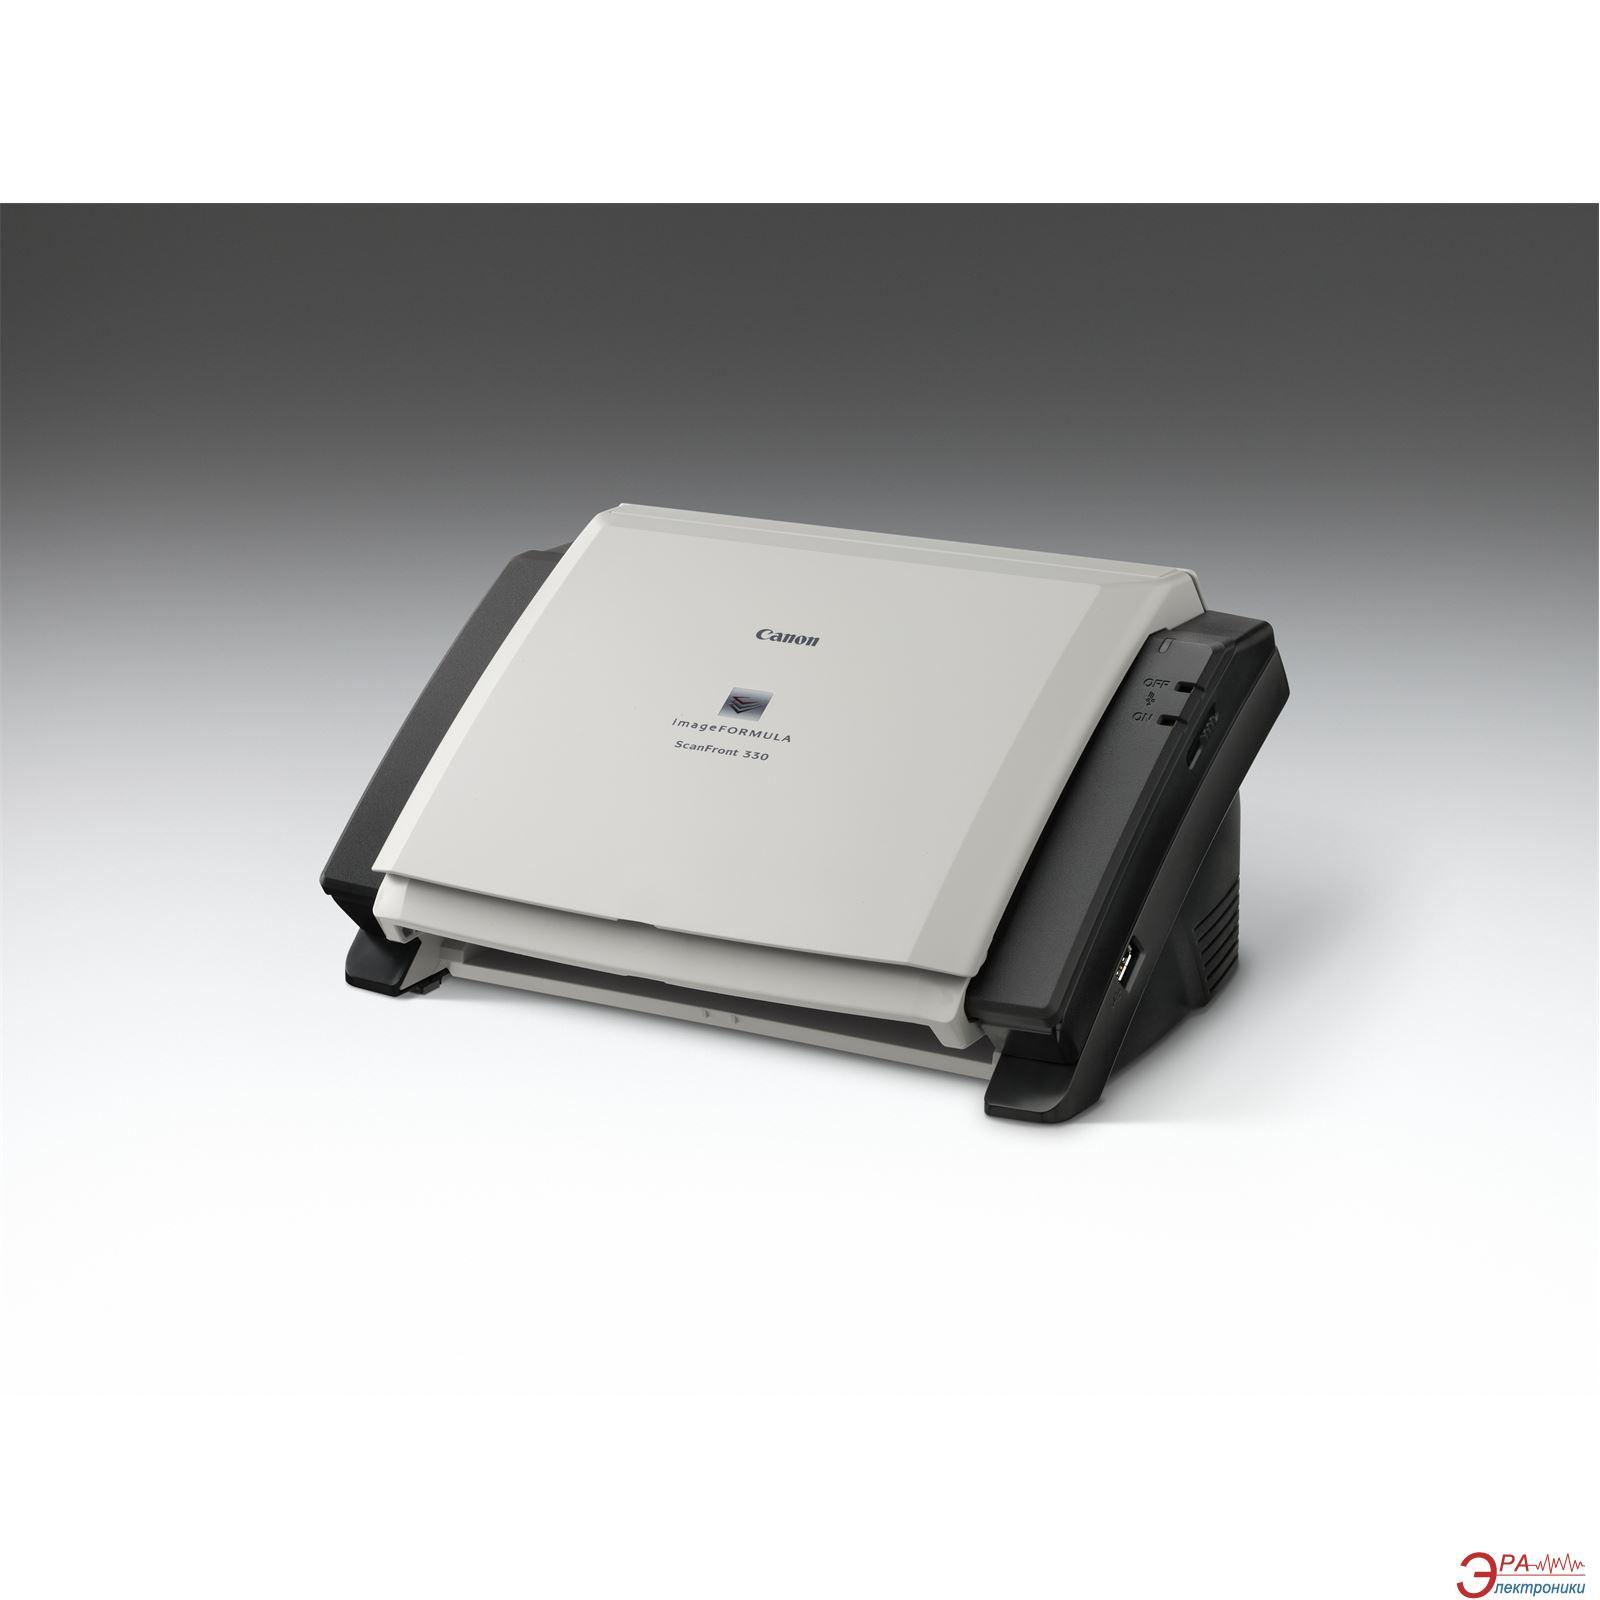 Сканер А4 Canon ScanFront 330 (8683B003)